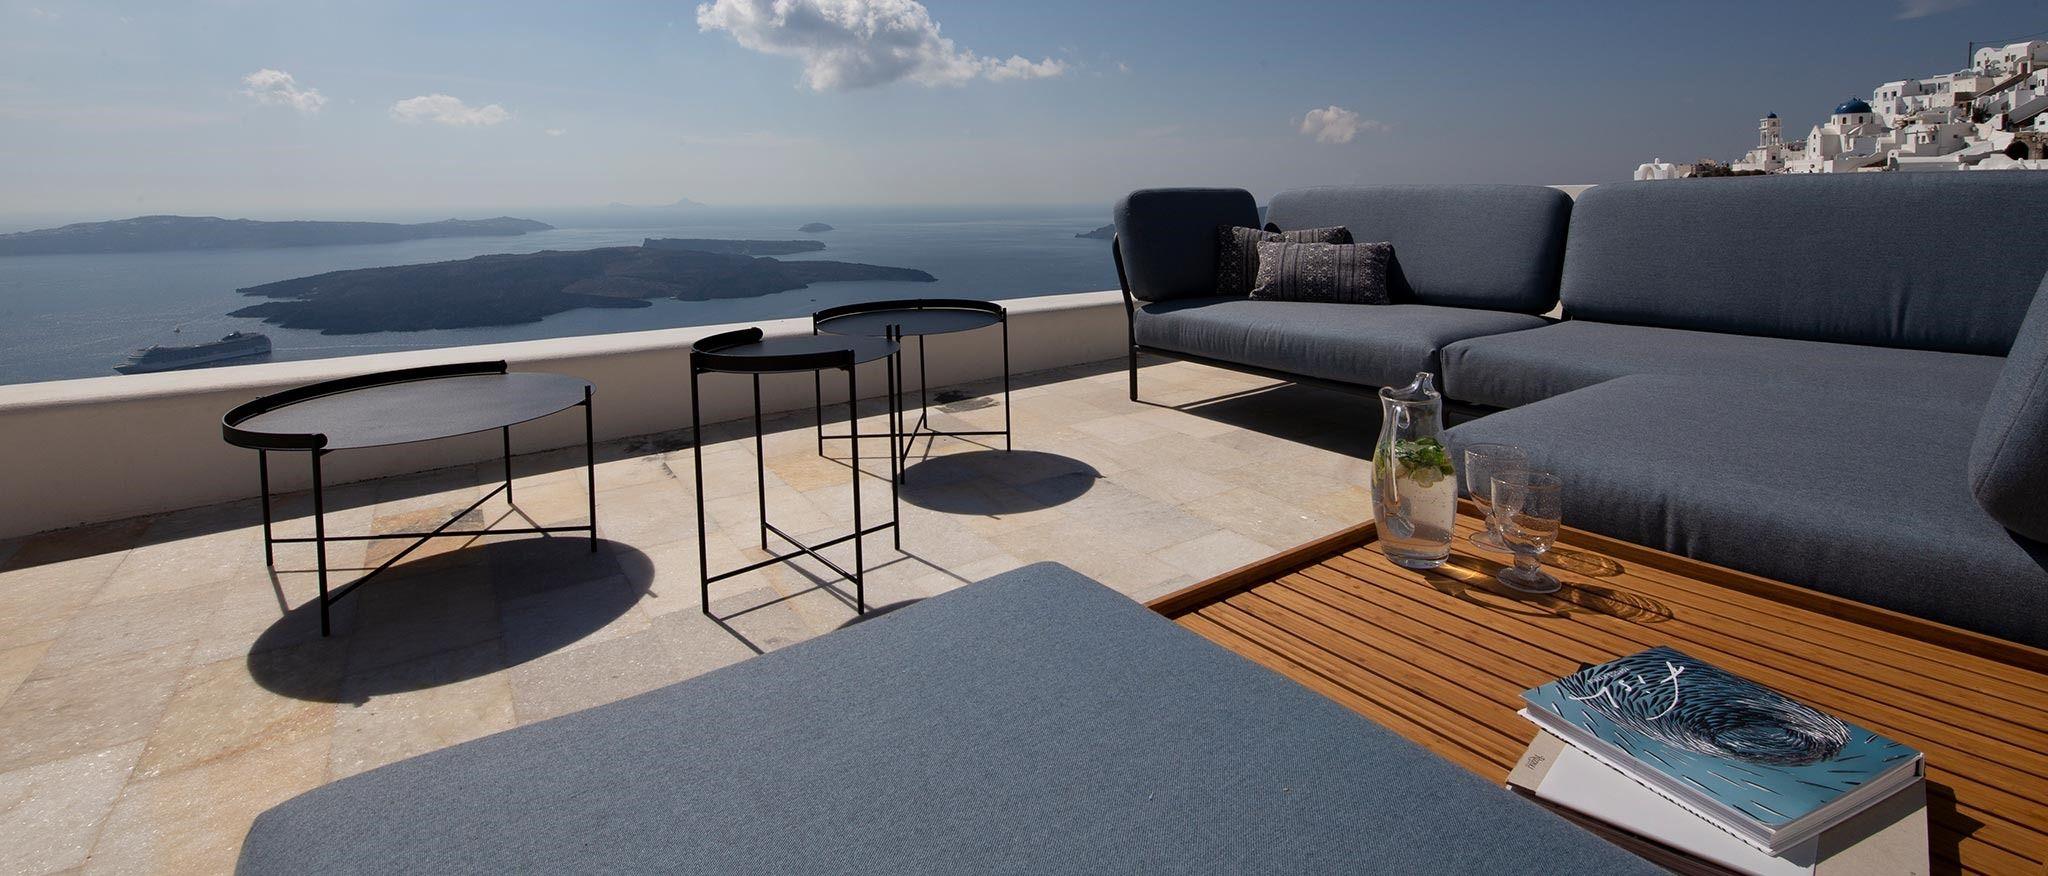 Outdoor Lounge | Houe | Outdoor Lounge, Lounge, Outdoor ... encequiconcerne Houe De Jardin